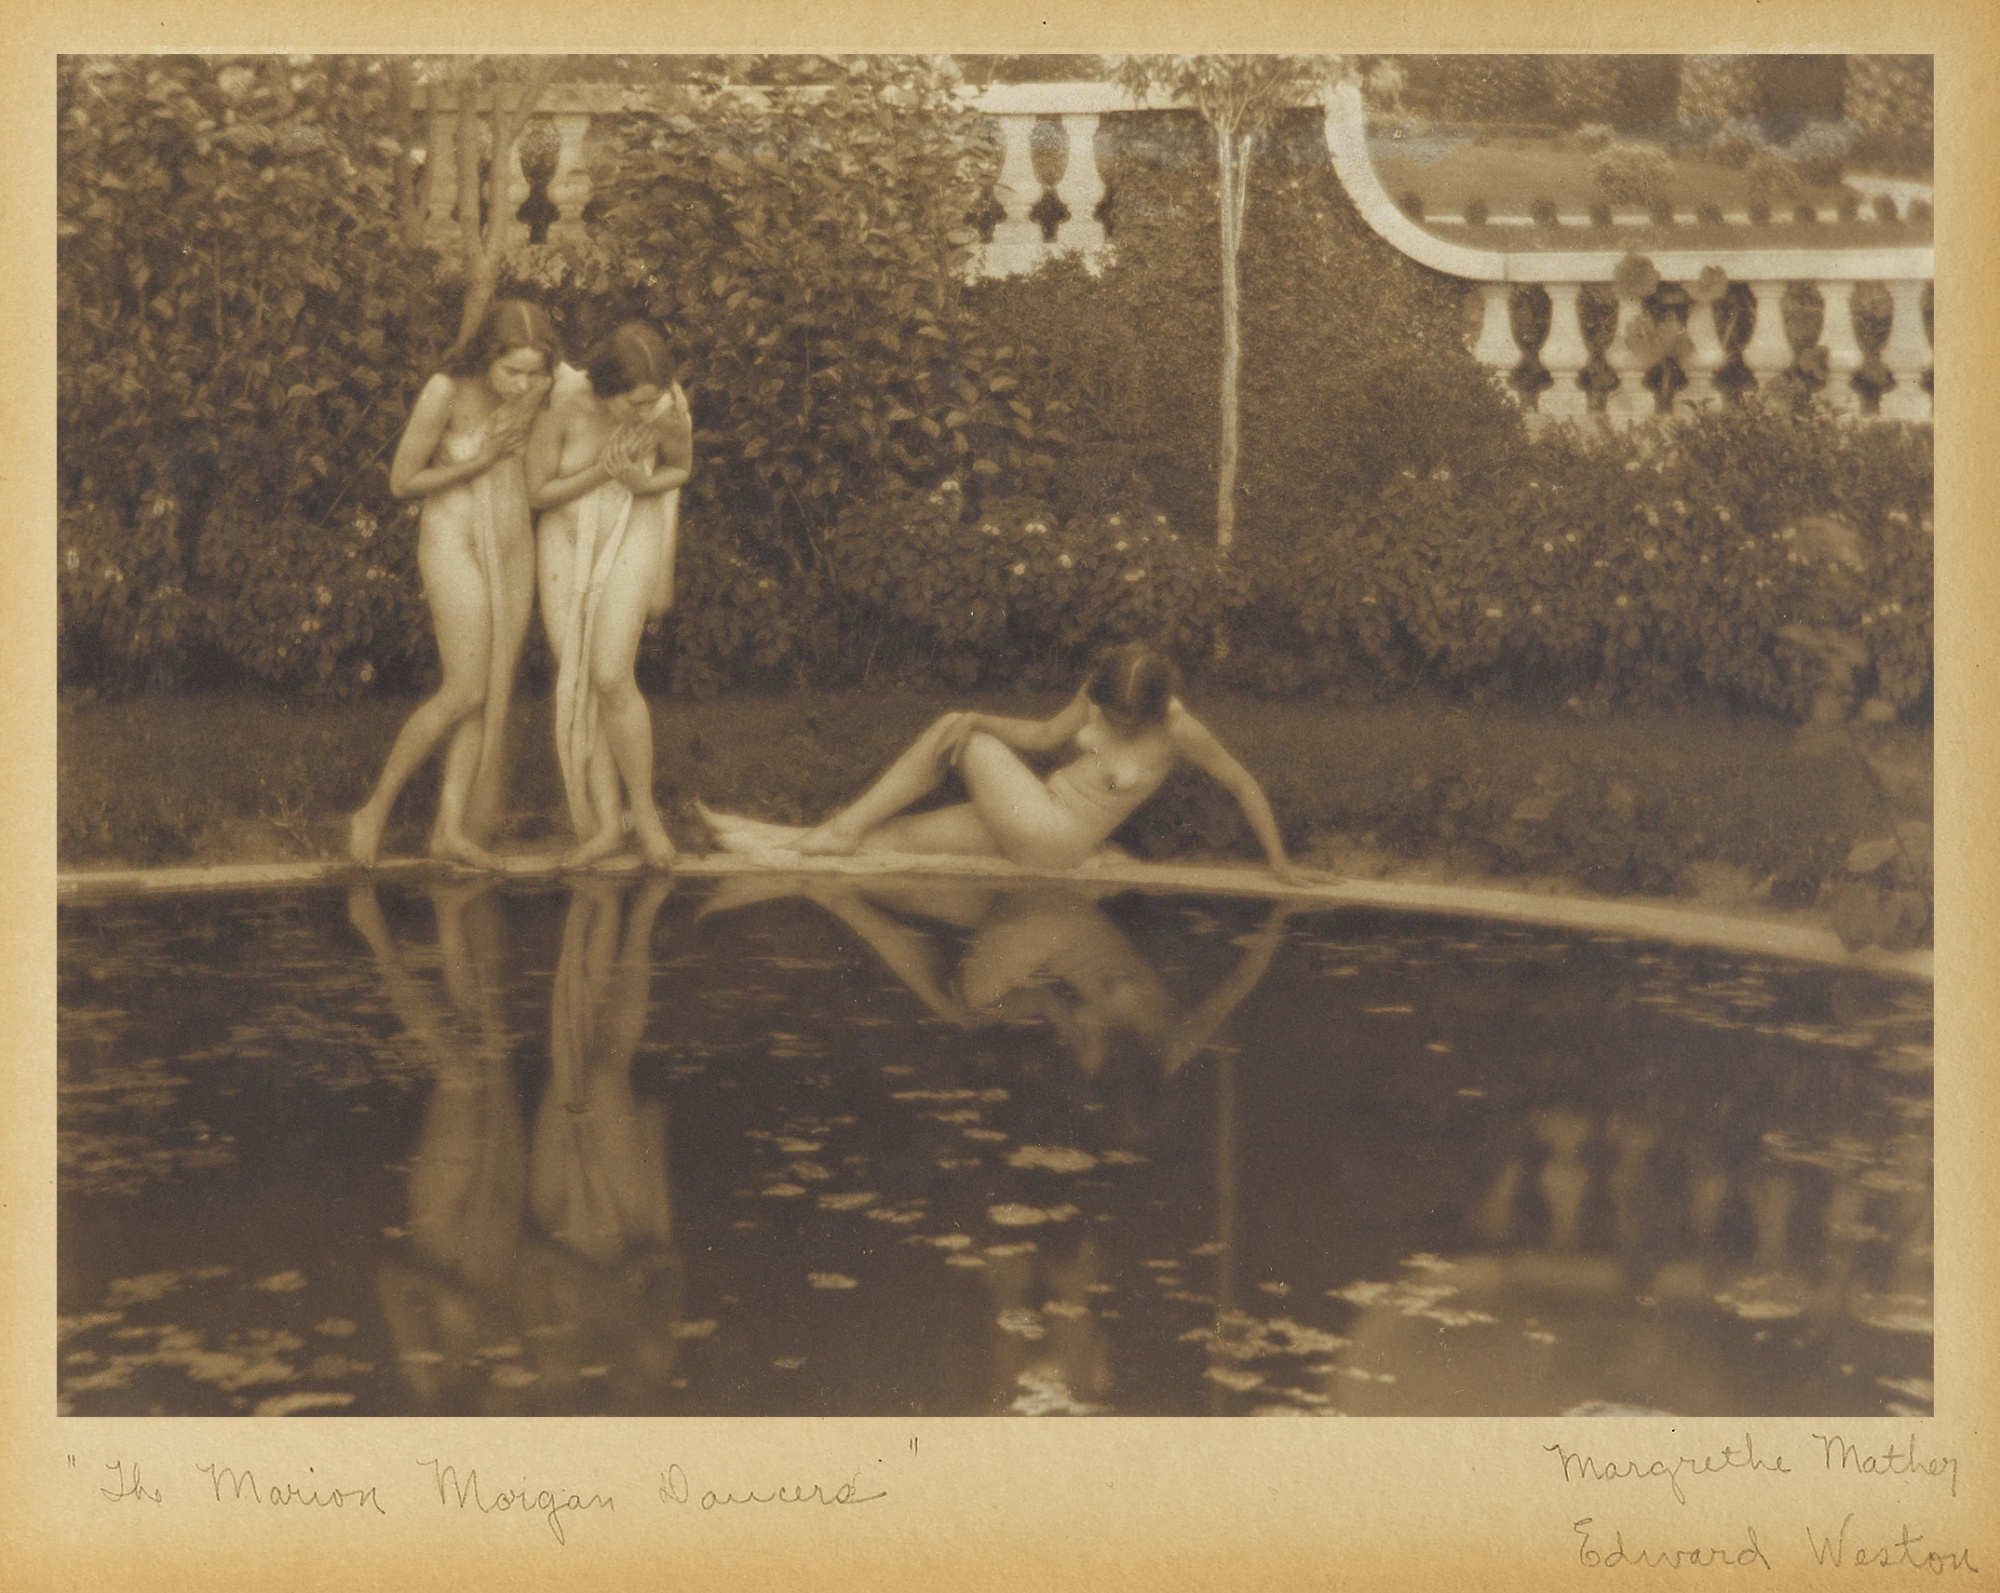 Edward Weston-The Marion Morgan Dancers California-1921